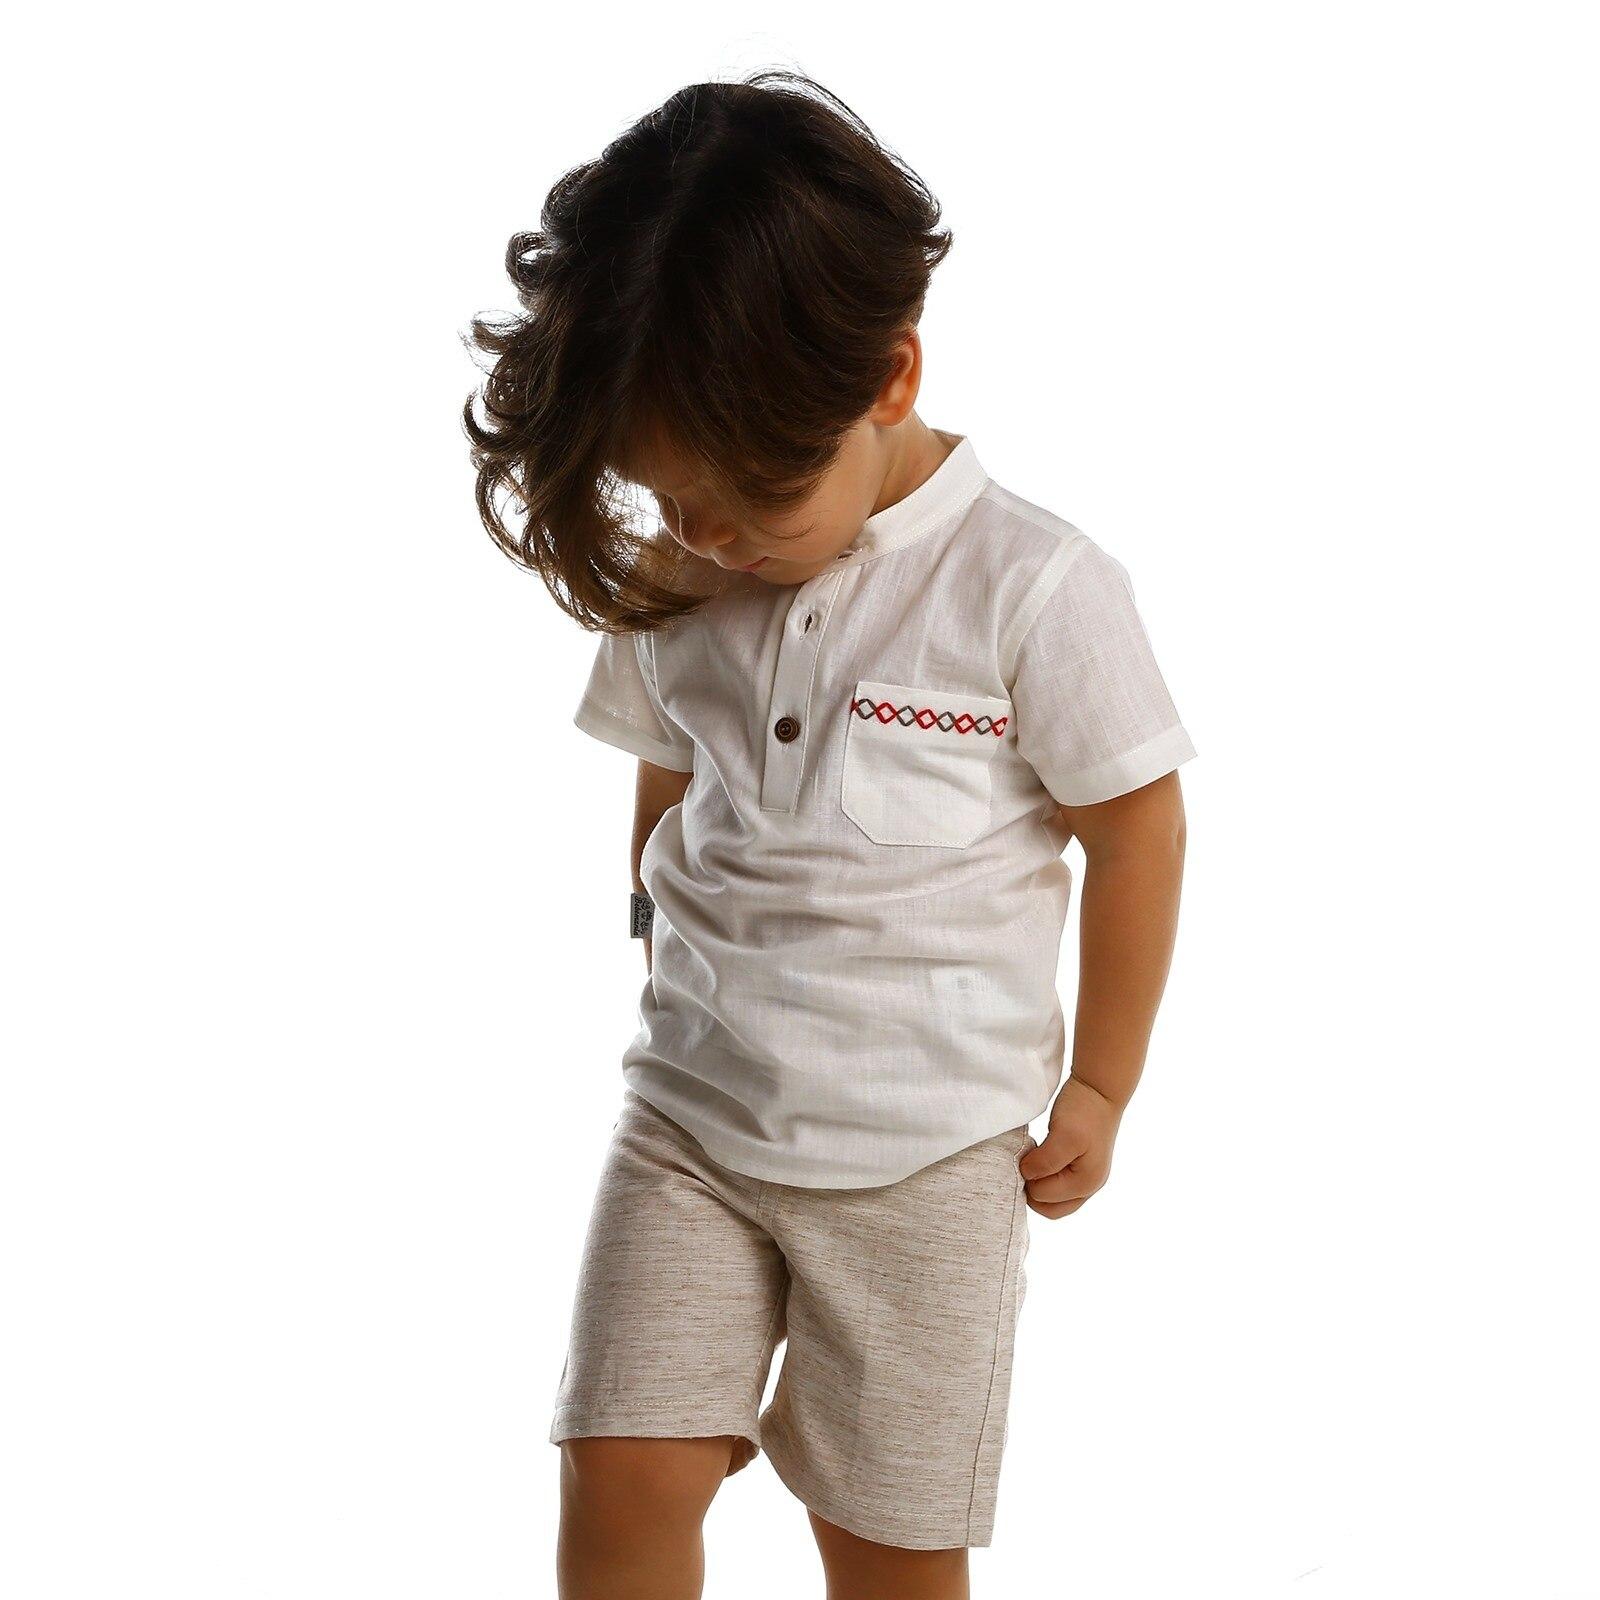 Ebebek Bebemania Summer Baby Boy Indian Shirt Short 2 Pcs Set